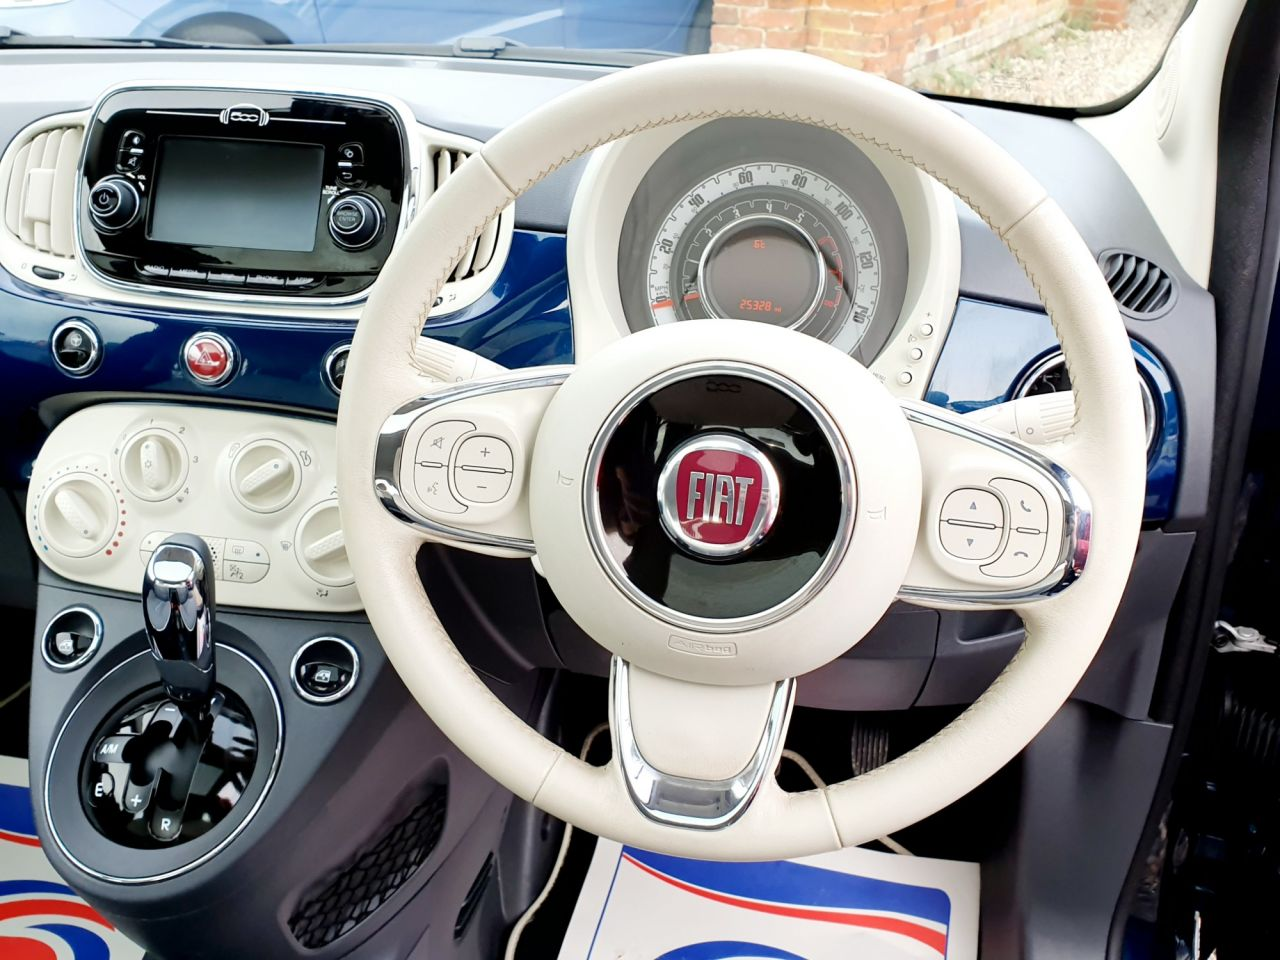 2017 Fiat 500 Lounge Dualogic 7 995